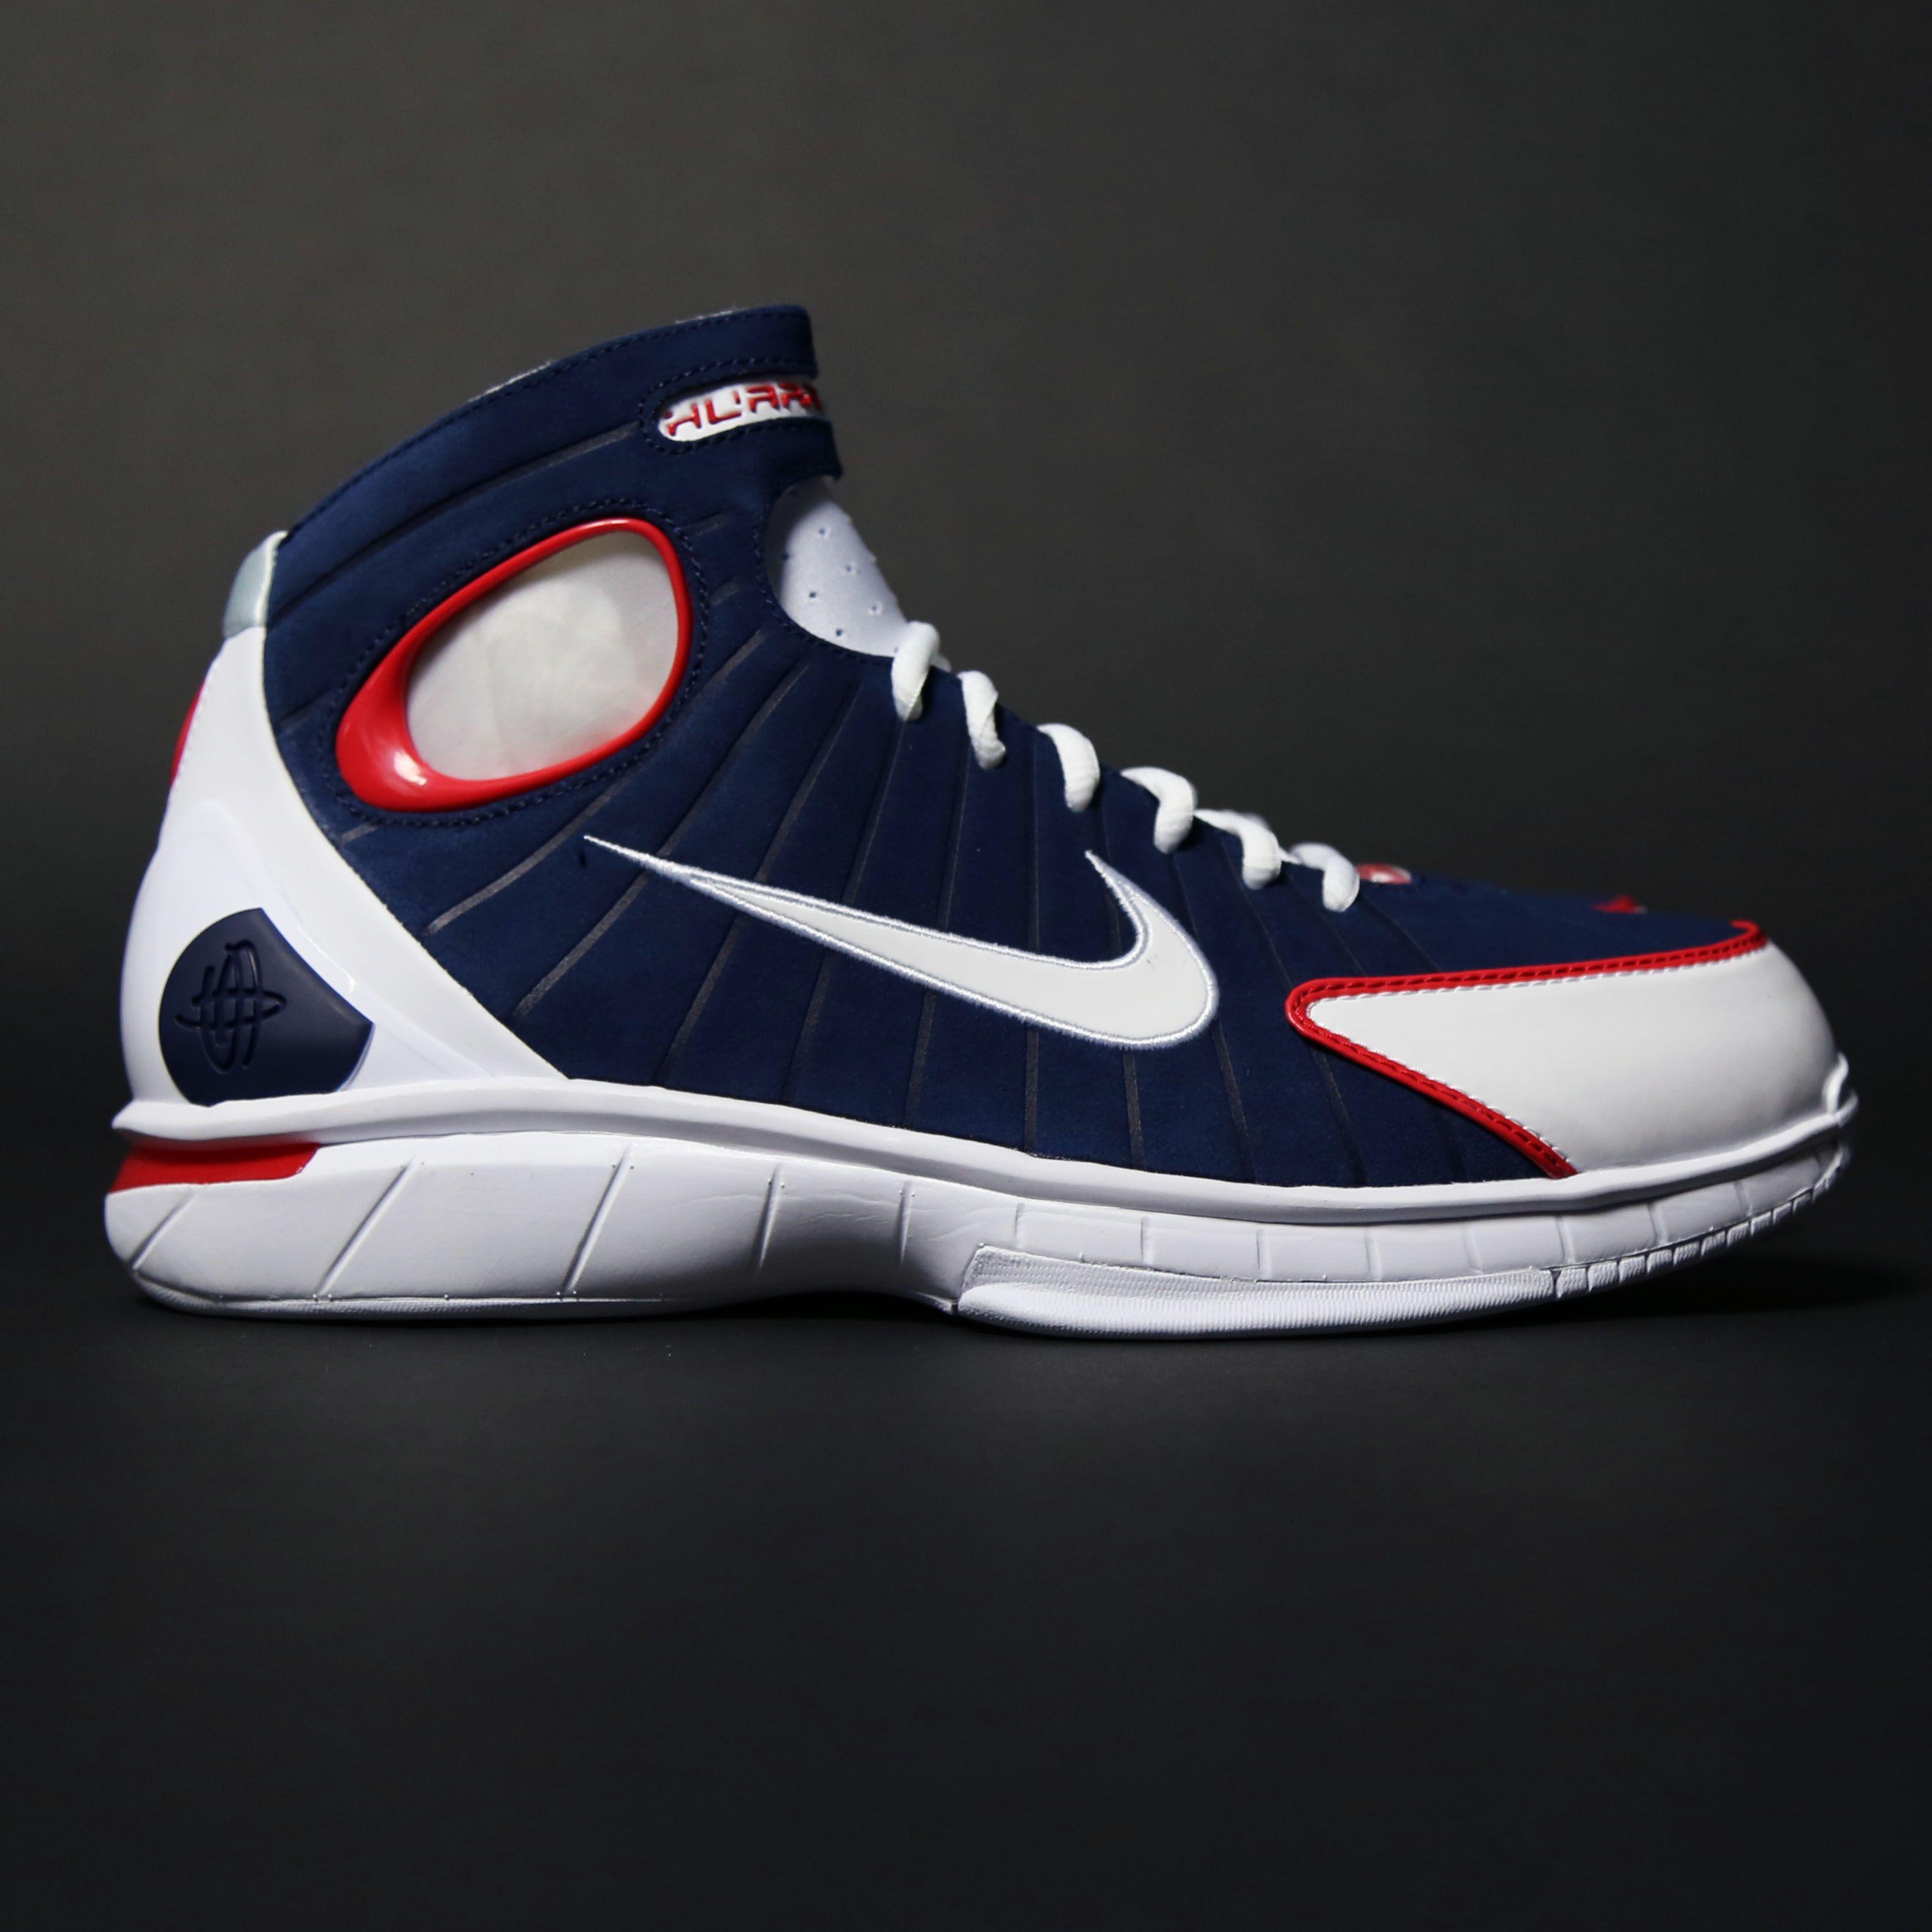 5a021d9c0370 ... 2005 Nike Air Zoom Huarache 2K5 Sneakers For Sale Pinterest Nike  basketball